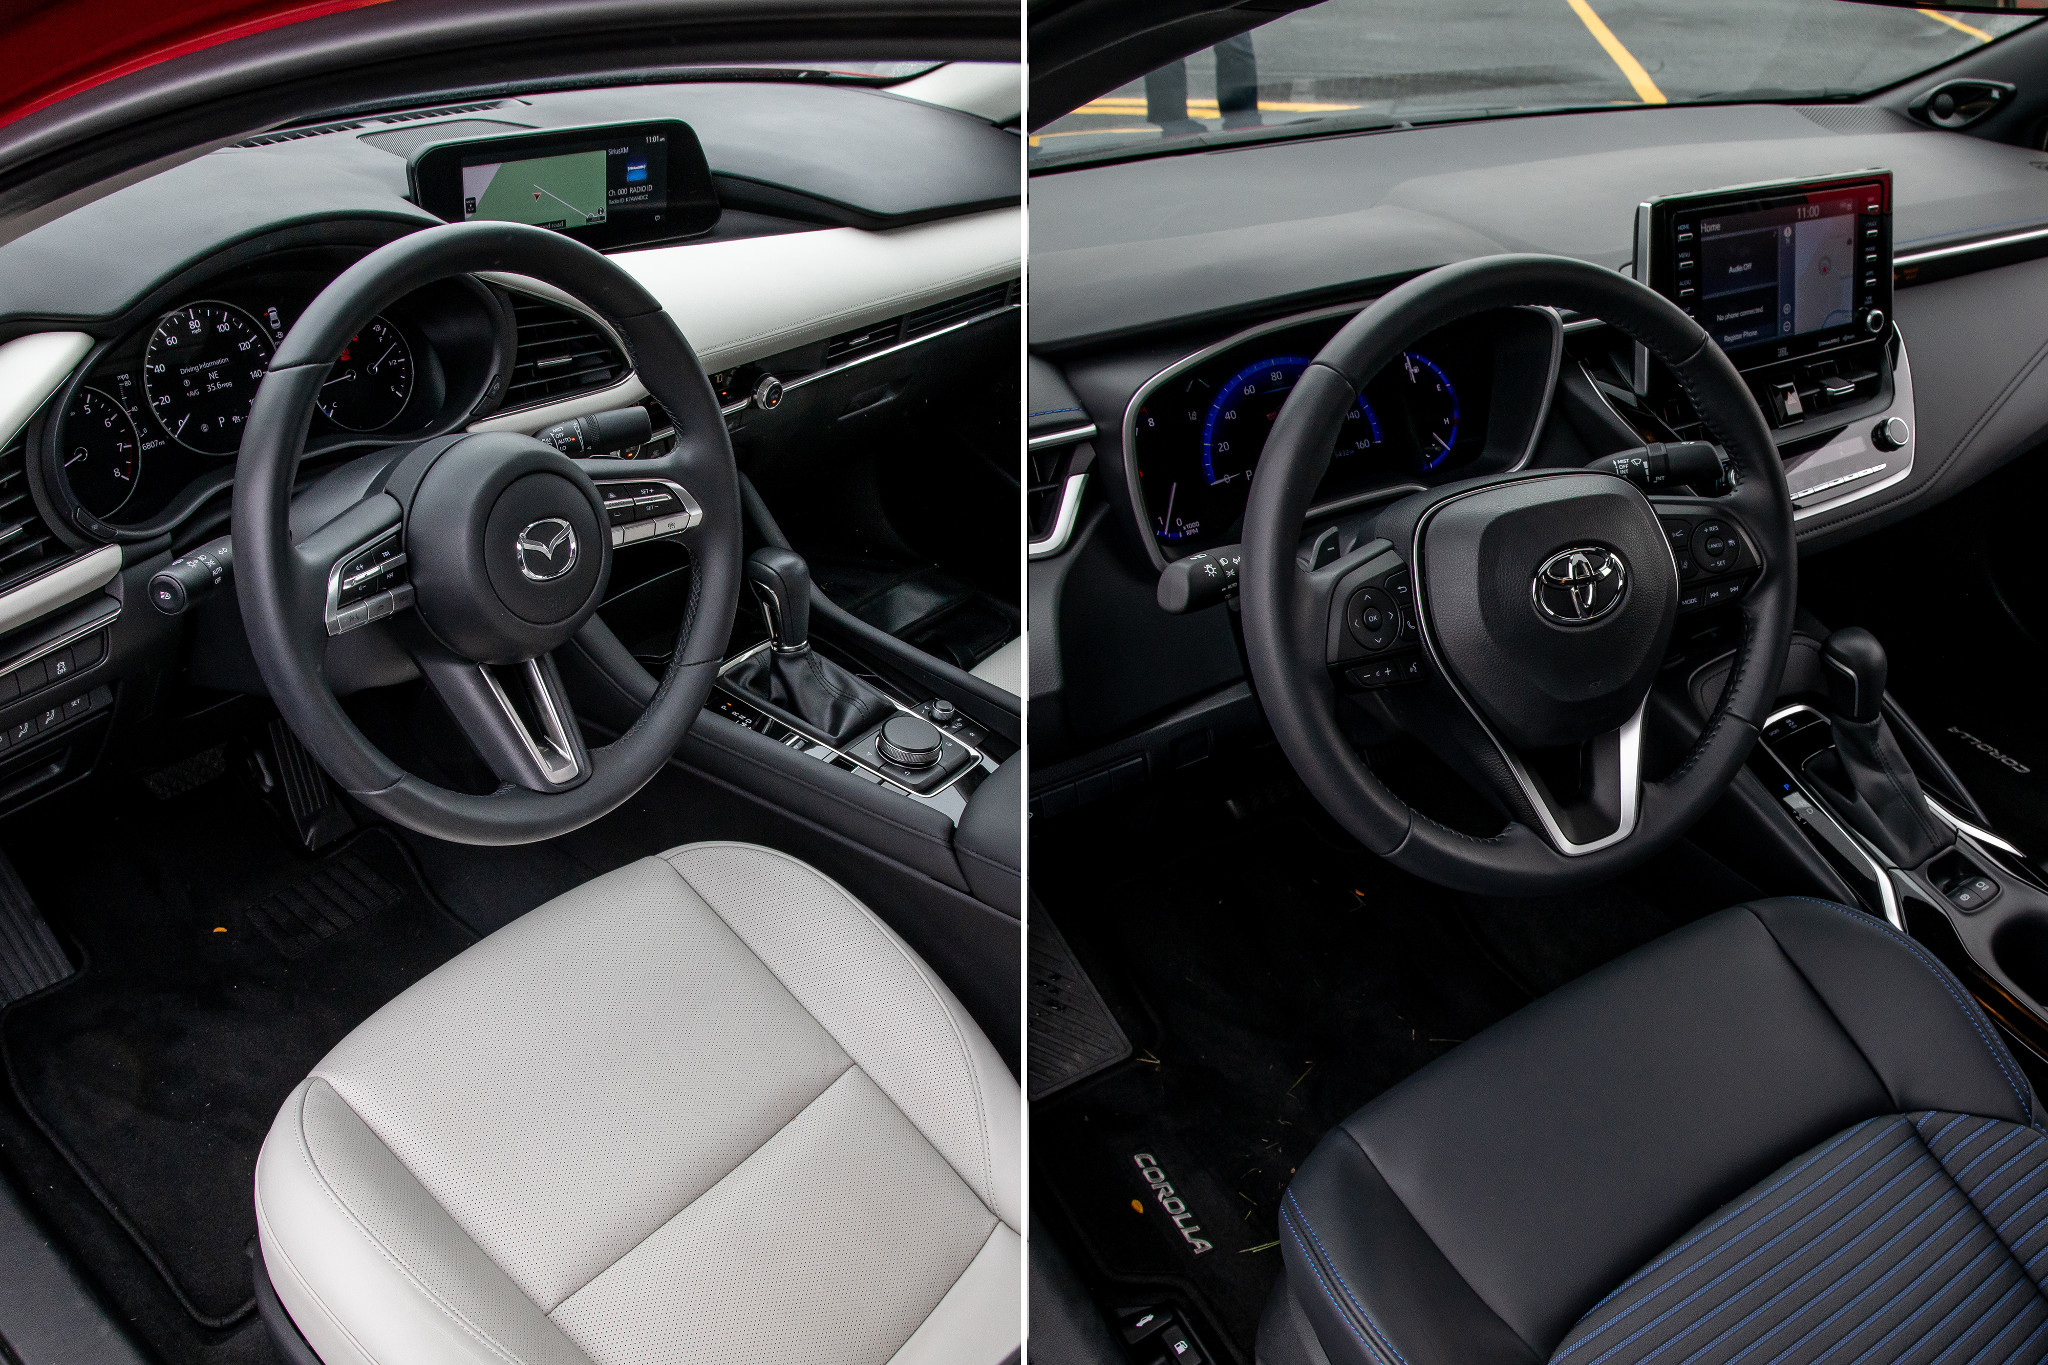 mazda-3-2020-toyota-corolla-xse-2020-03front-row--interior.jpg